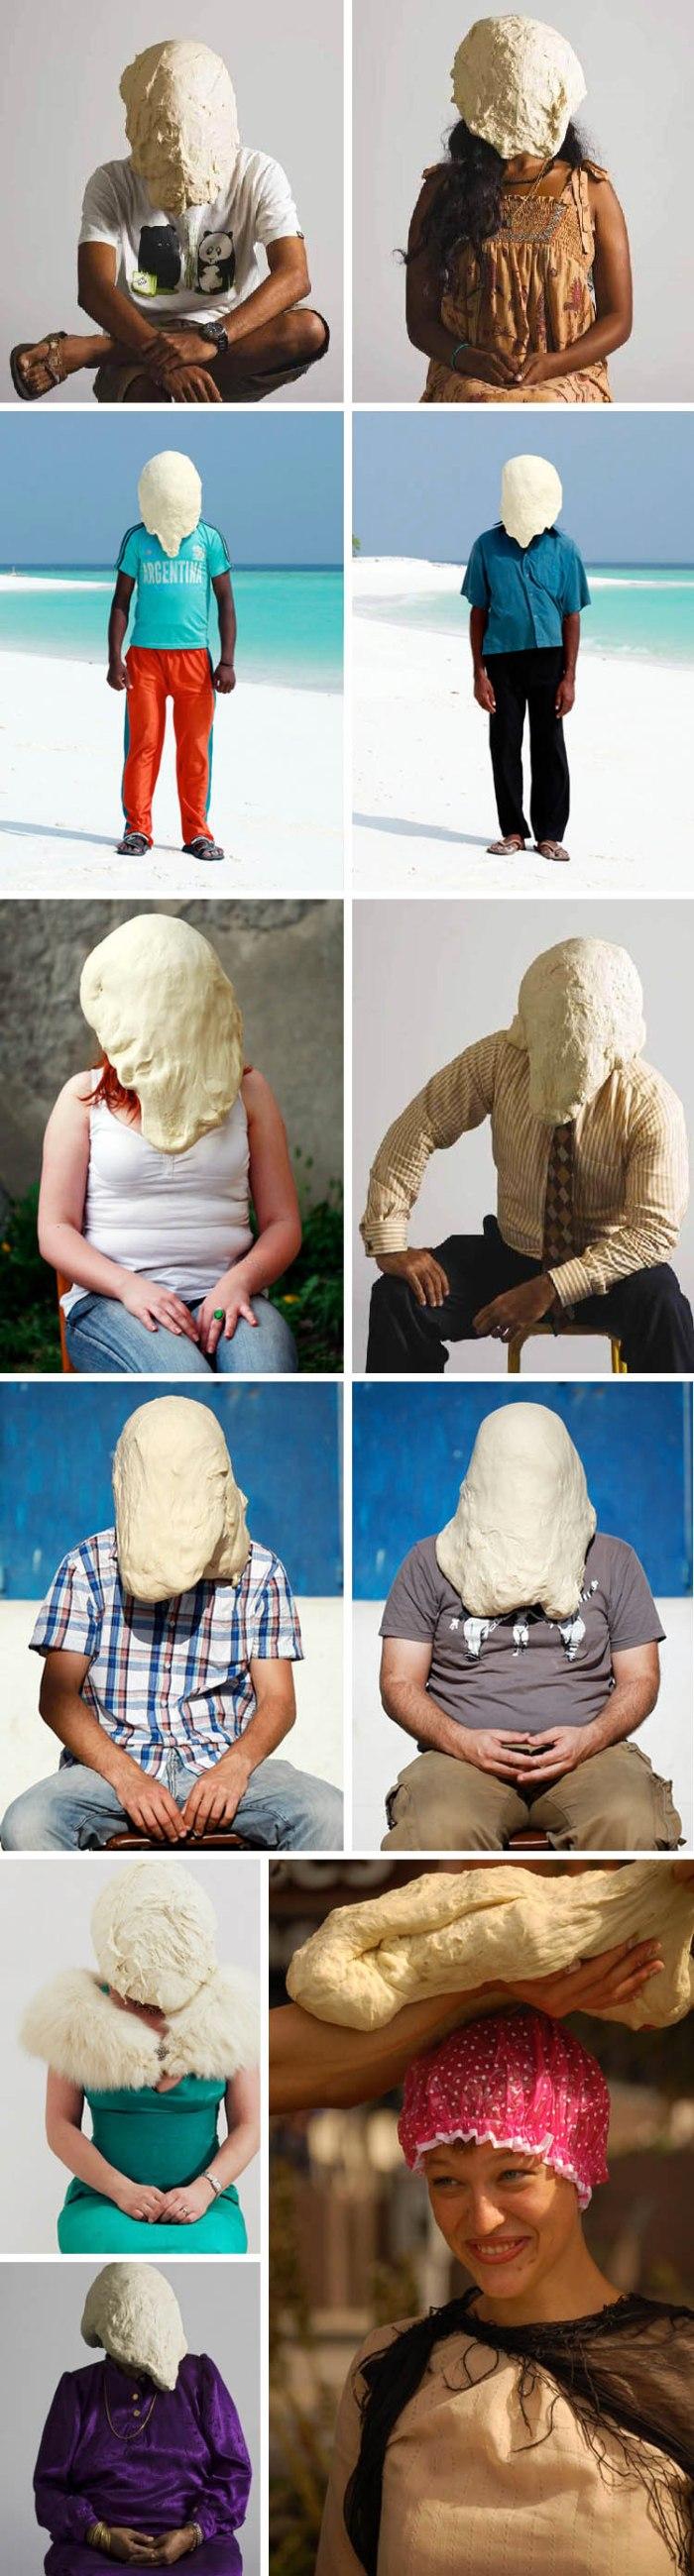 Danish contemporary photography, humorous portraits with dough on people's heads, Soren Dahlgaard